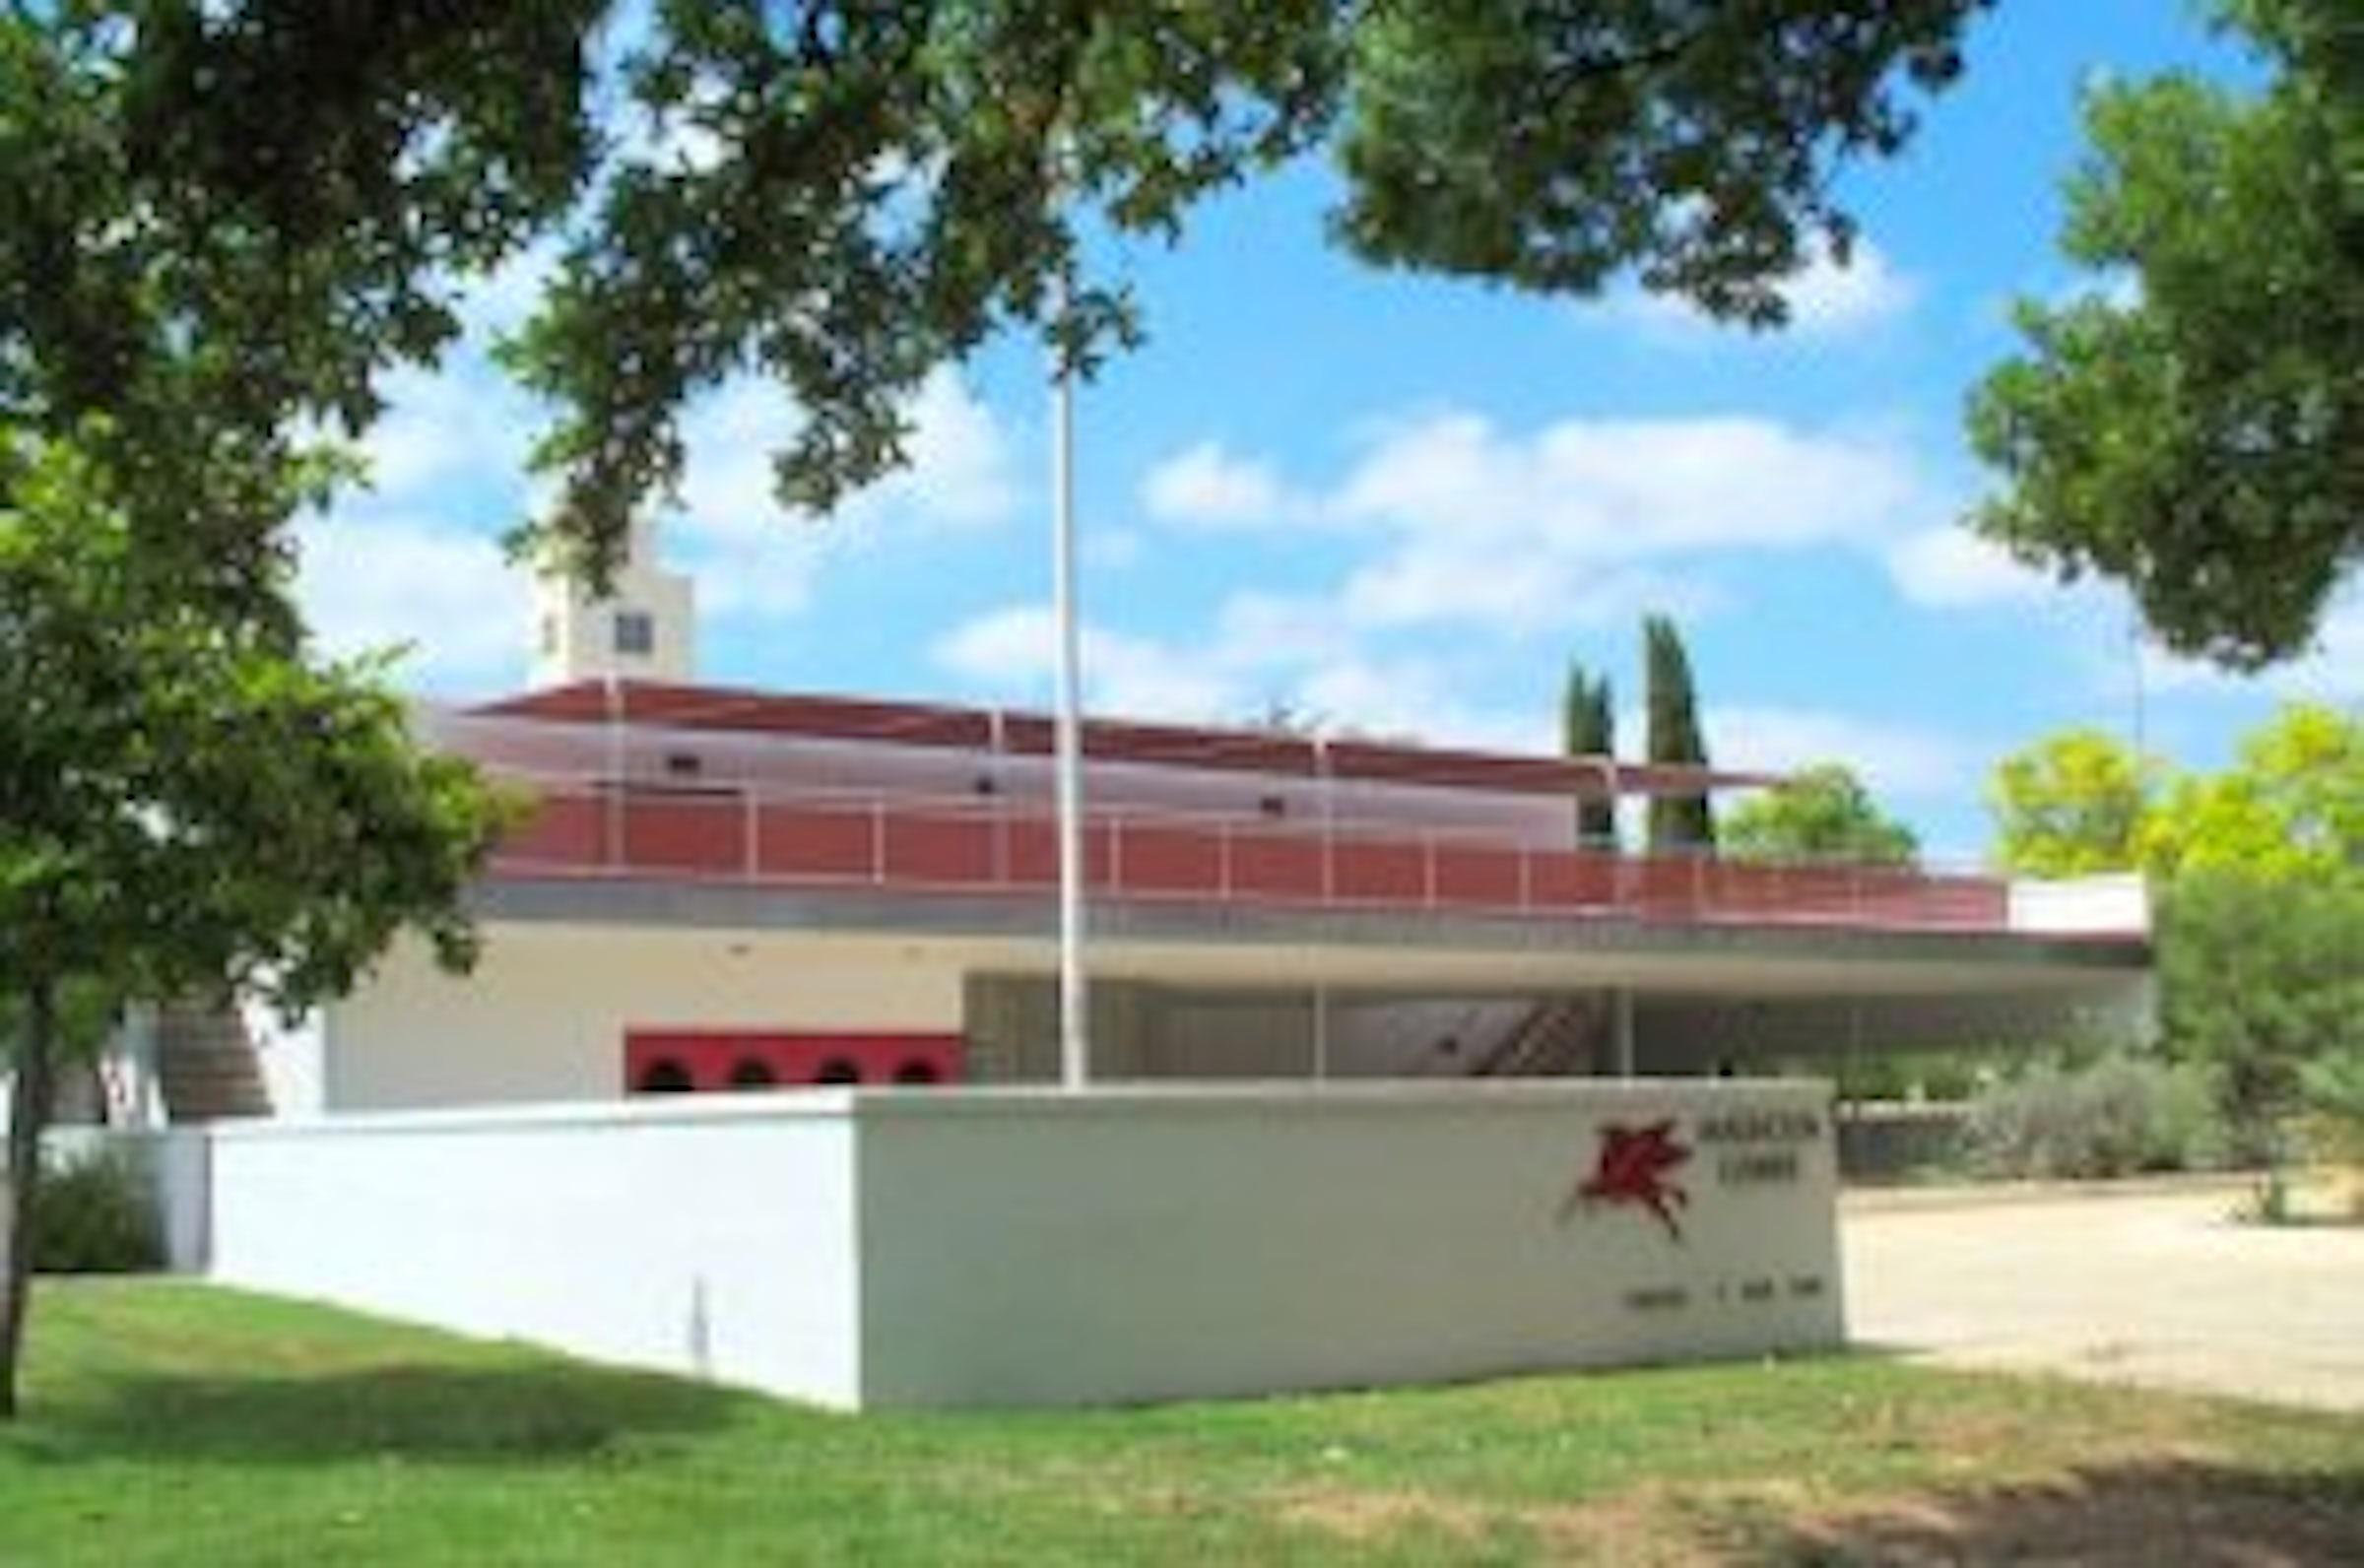 Magnolia Lounge at Fair Park in Beyond Dallas